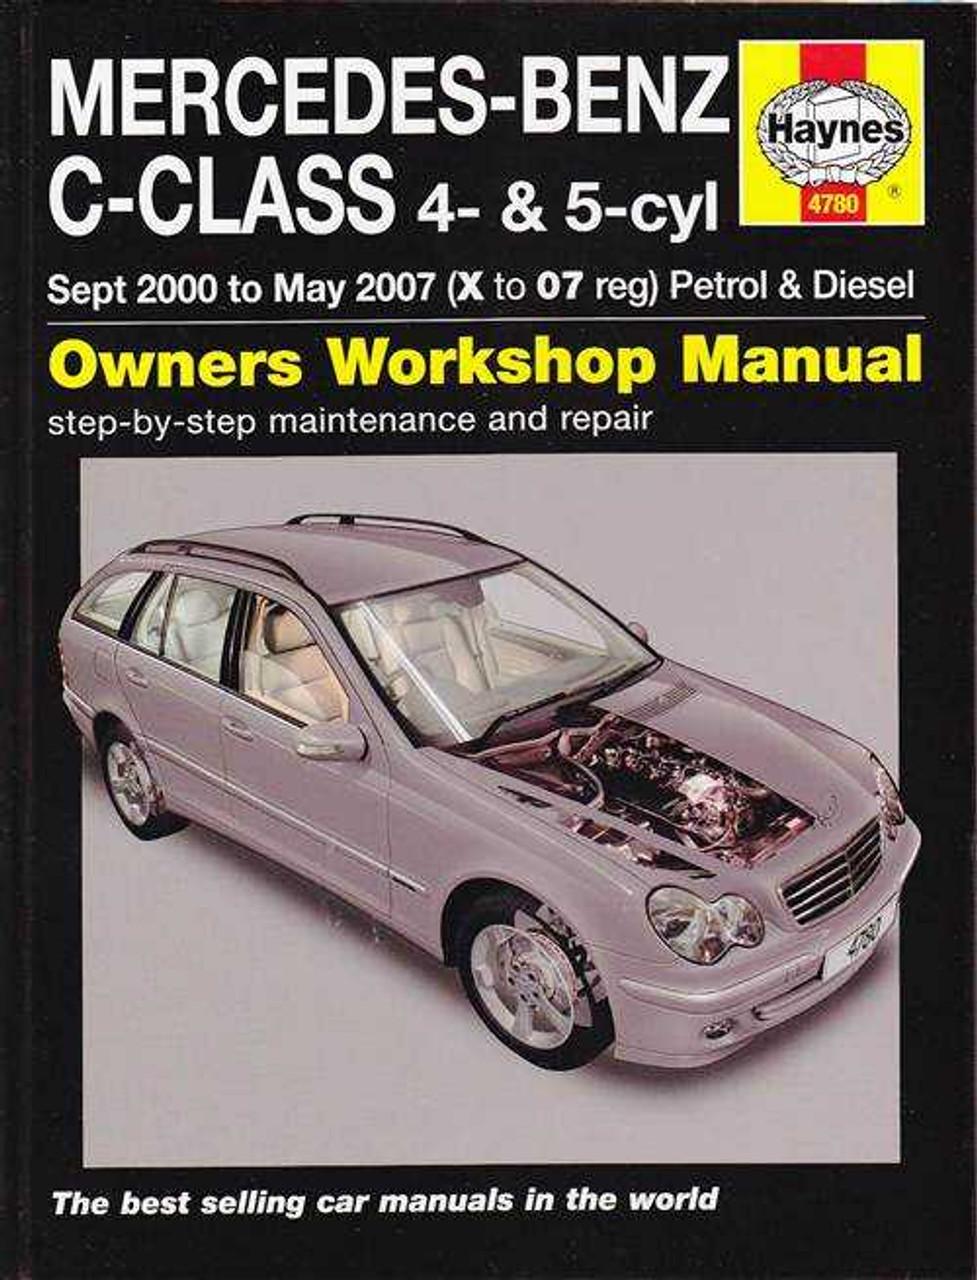 mercedes benz c class 4 5 cylinder petrol diesel 2000 2007 rh automotobookshop com au 1995 Mercedes C220 Mercedes E-Class Interior